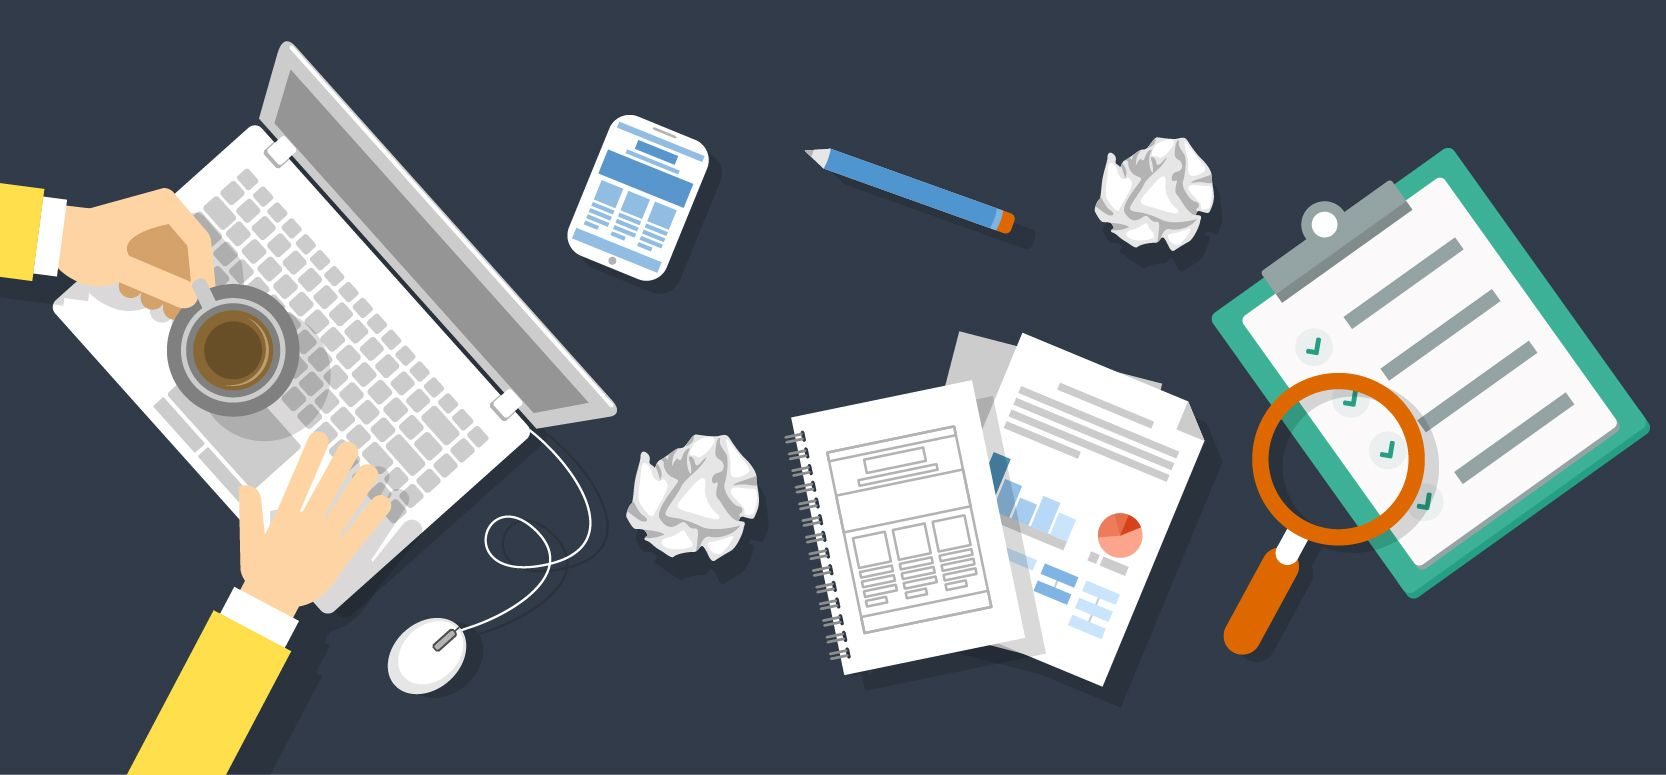 UX/UI Checklist for Web Design iPullRank